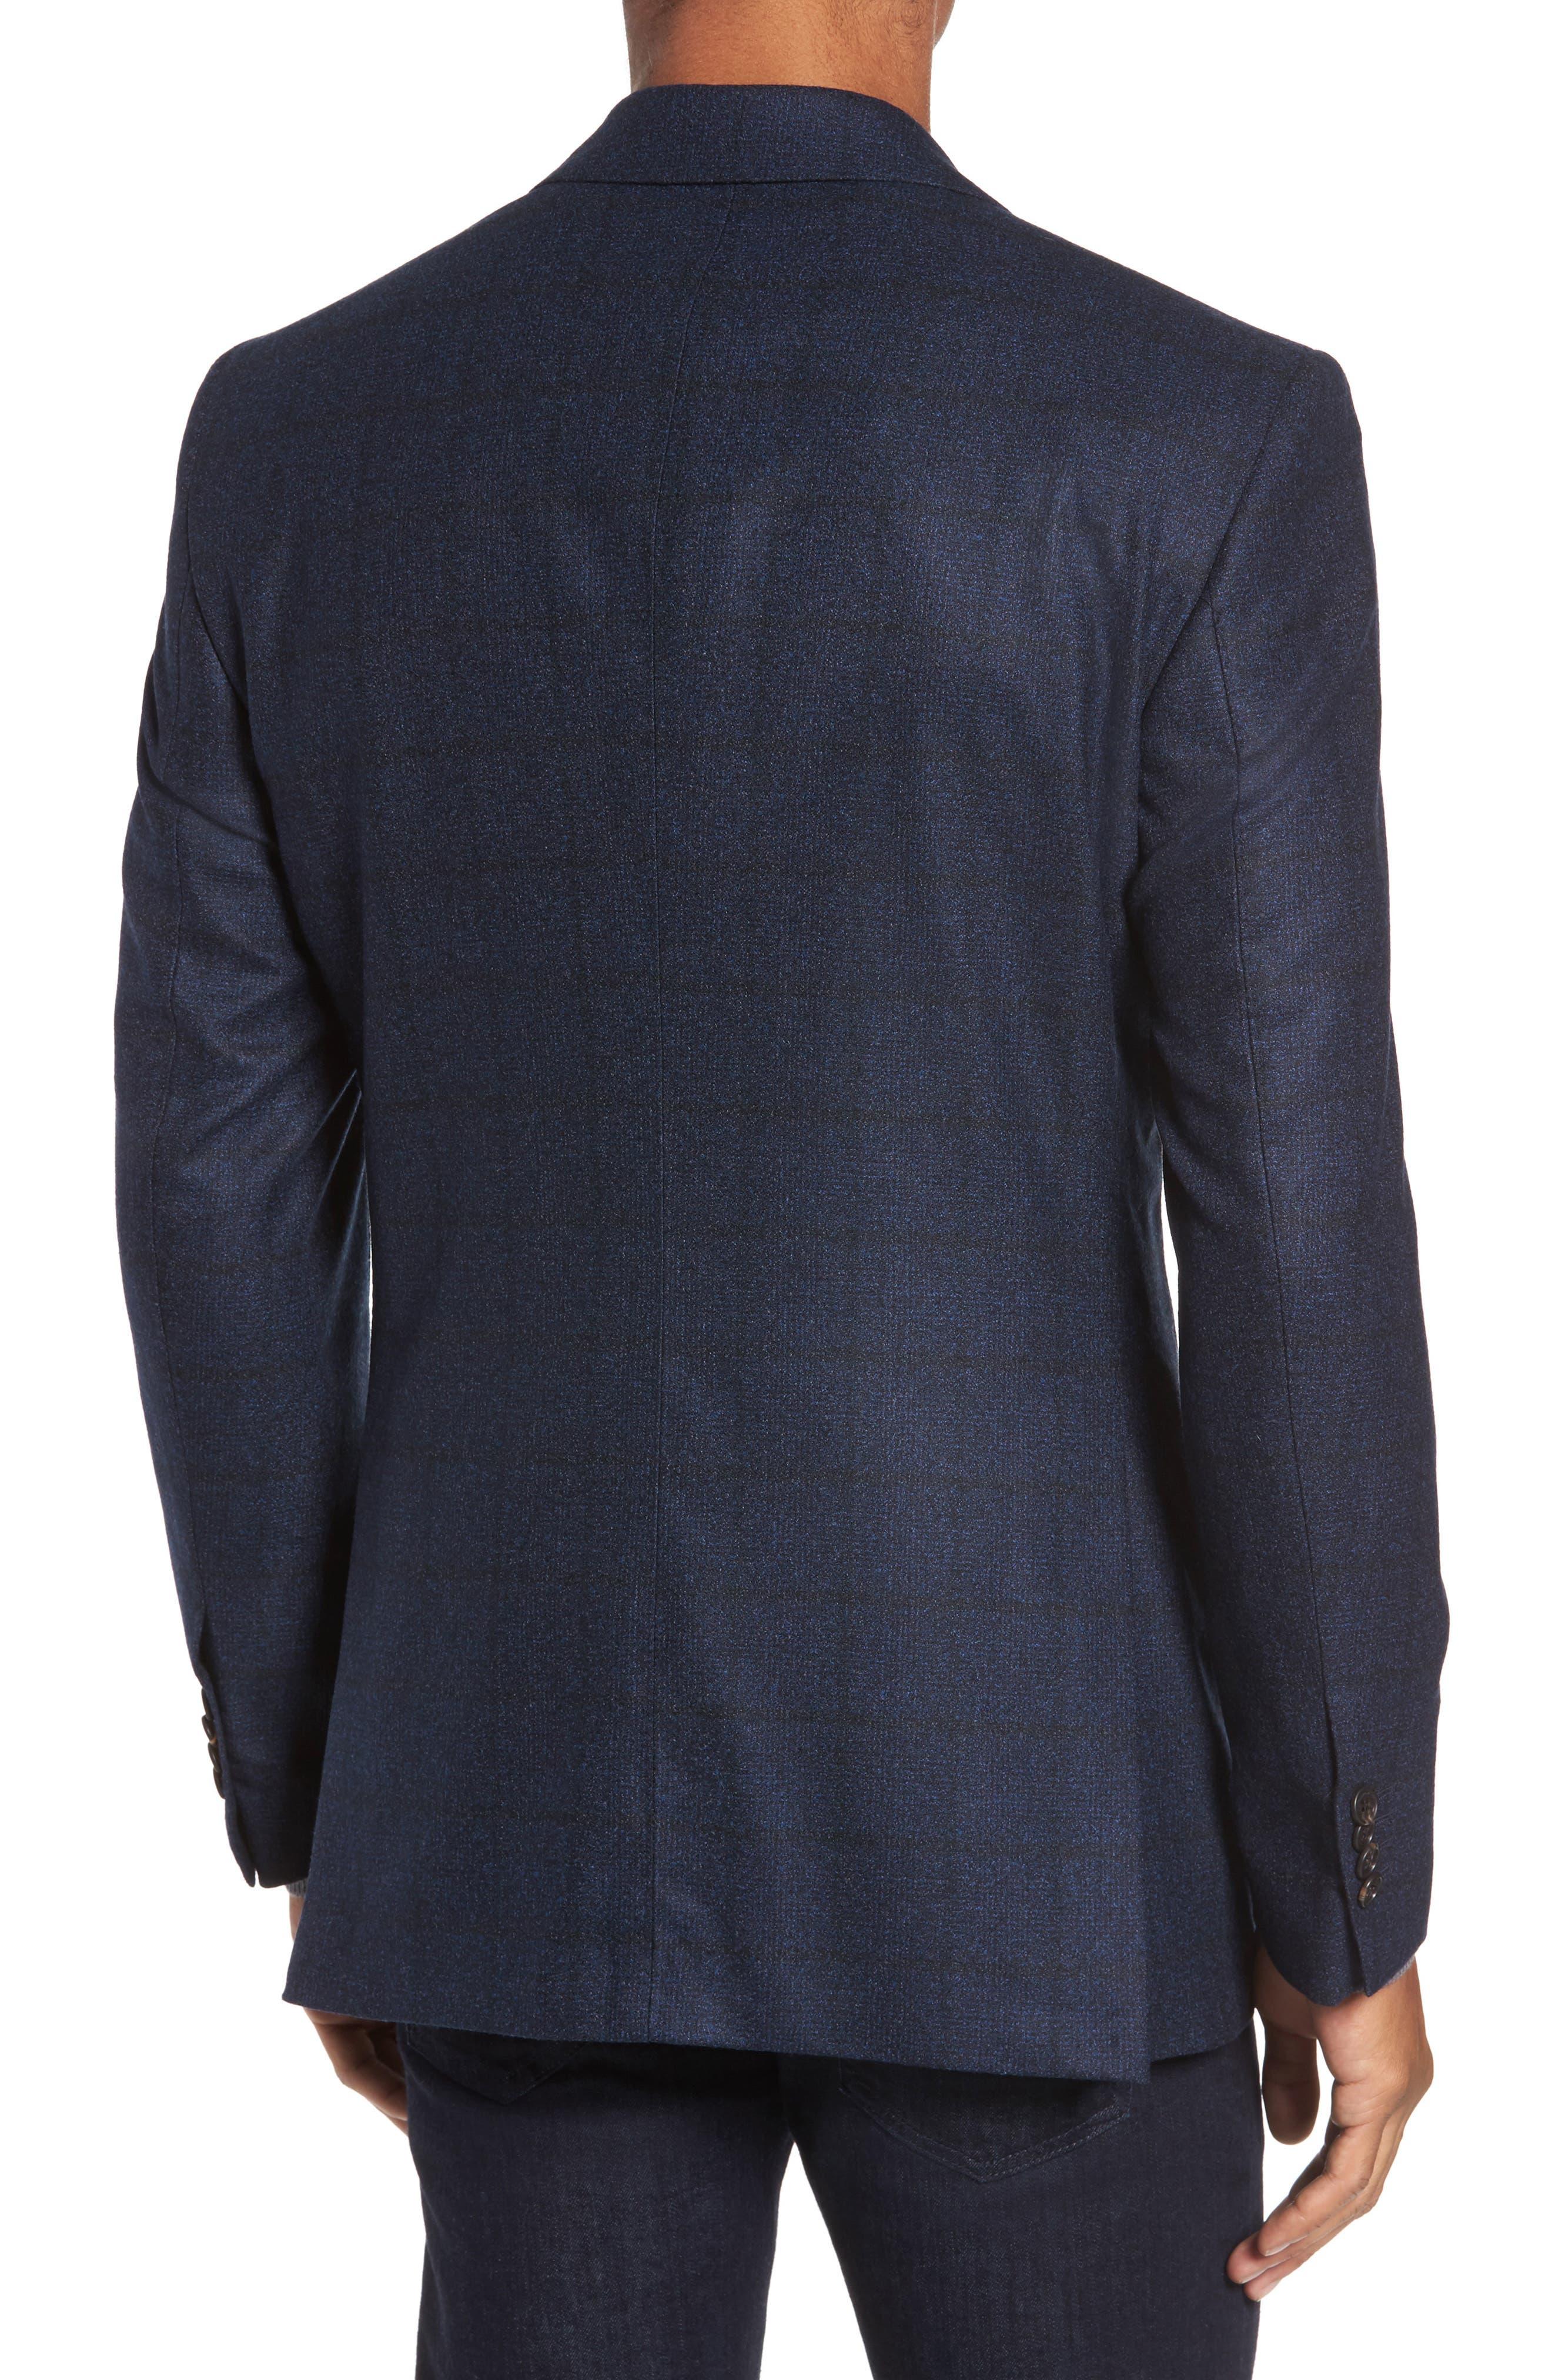 Andersen Trim Fit Plaid Wool Sport Coat,                             Alternate thumbnail 2, color,                             209